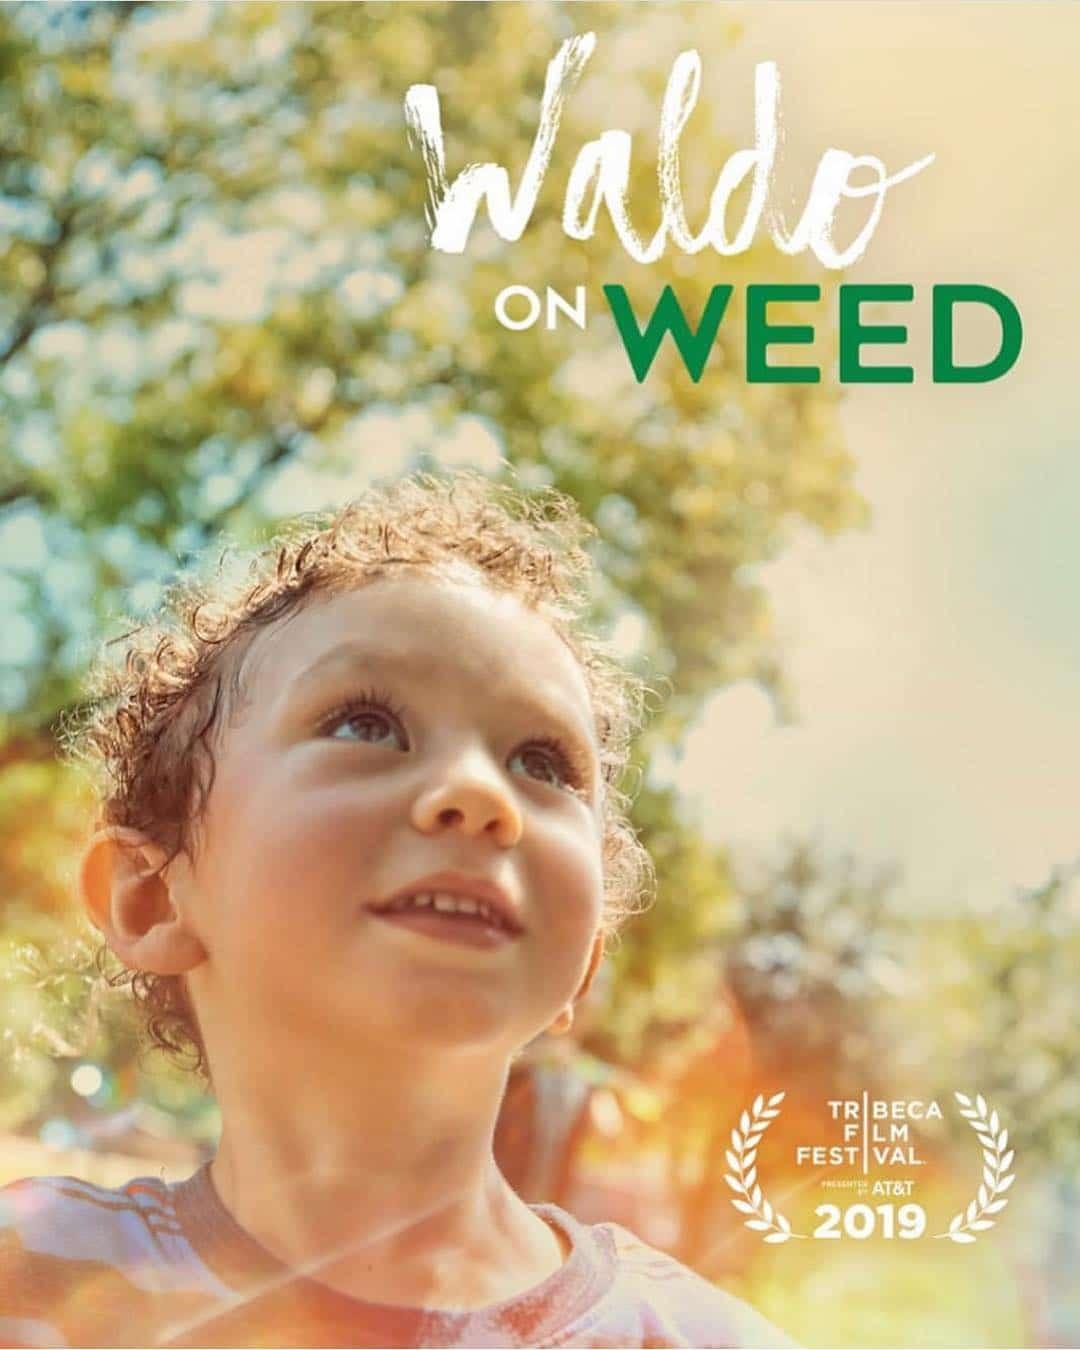 Waldo on Weed with Matt Rize